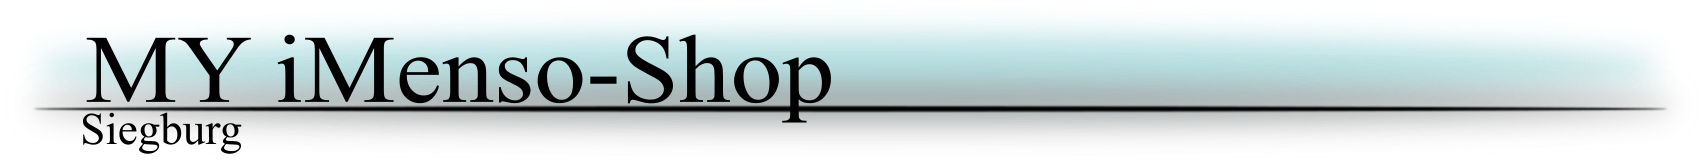 My iMenso Shop-Logo